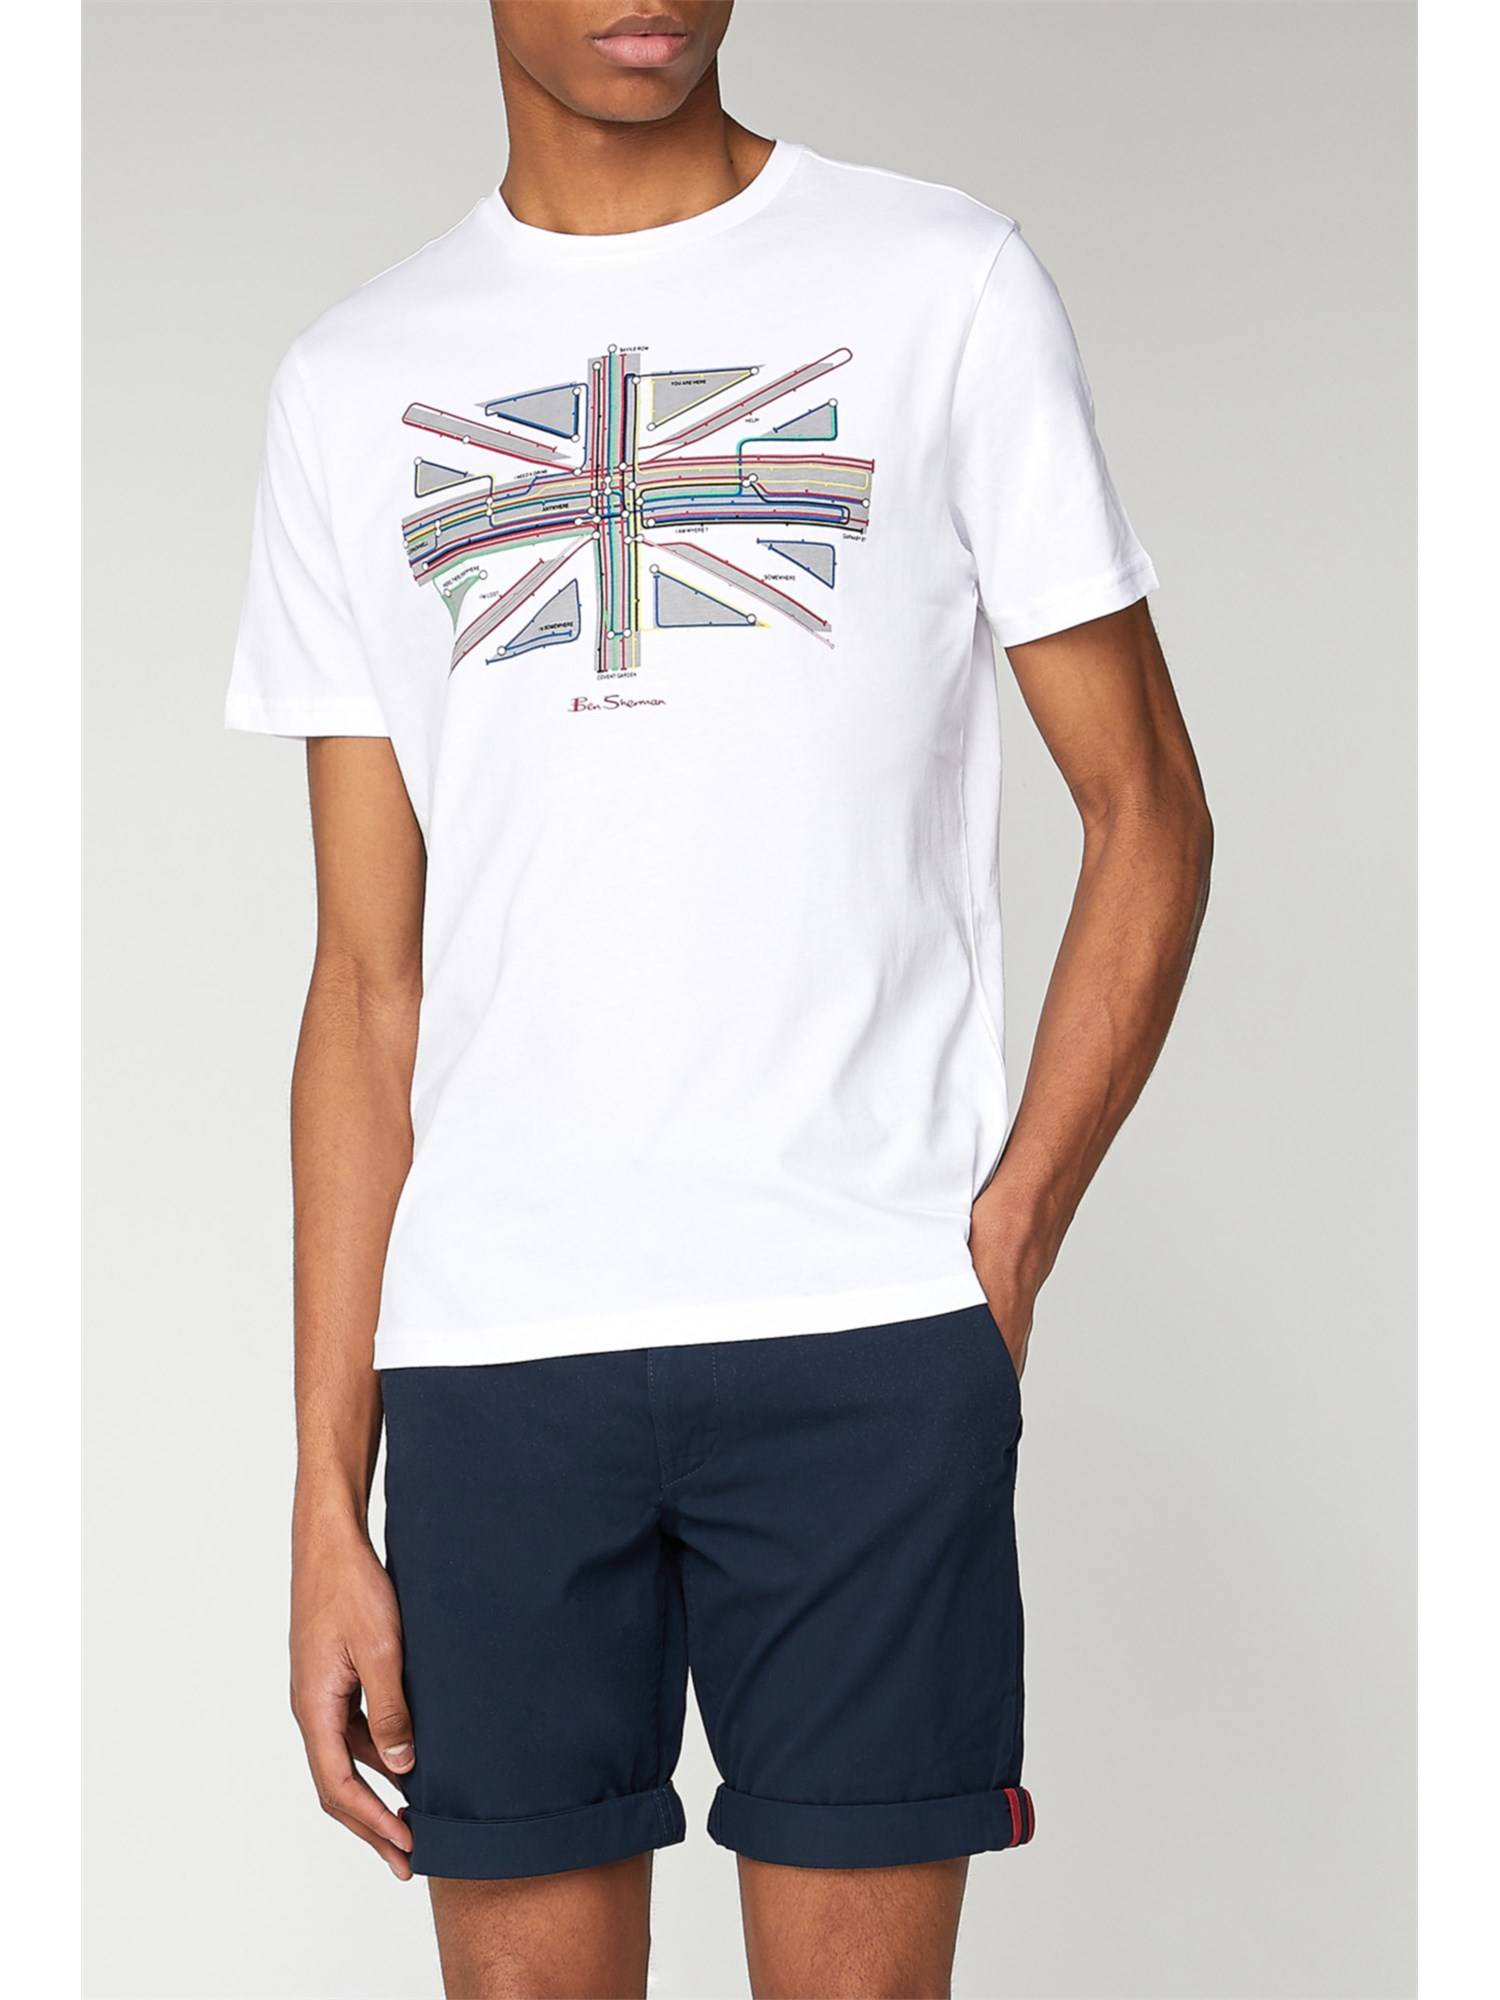 Ben Sherman White Underground Graphic T-Shirt Sml White